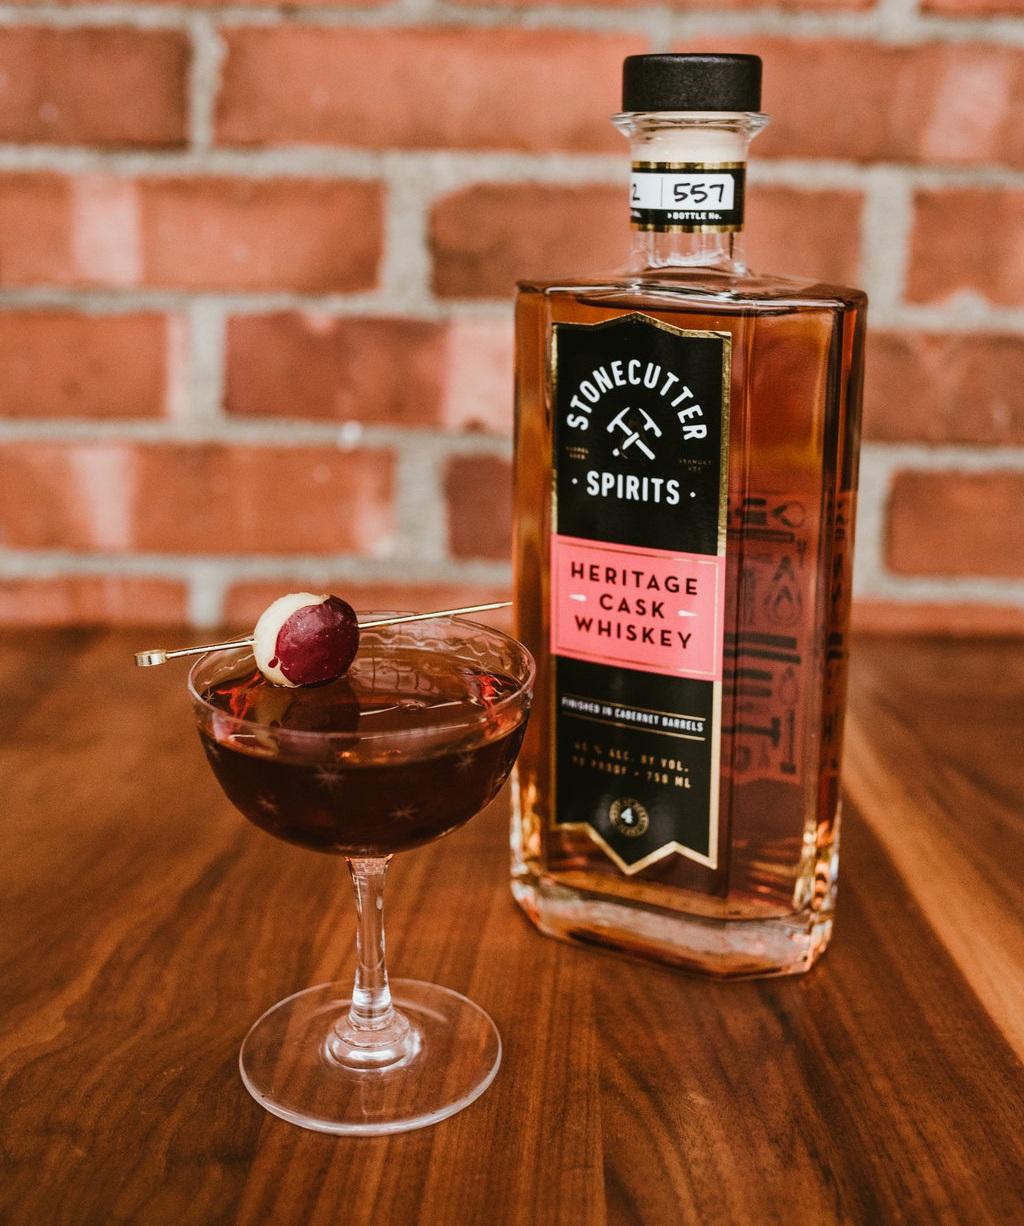 stonecutter+spirits+cocktail+recipes+-+washington%27s+heritage